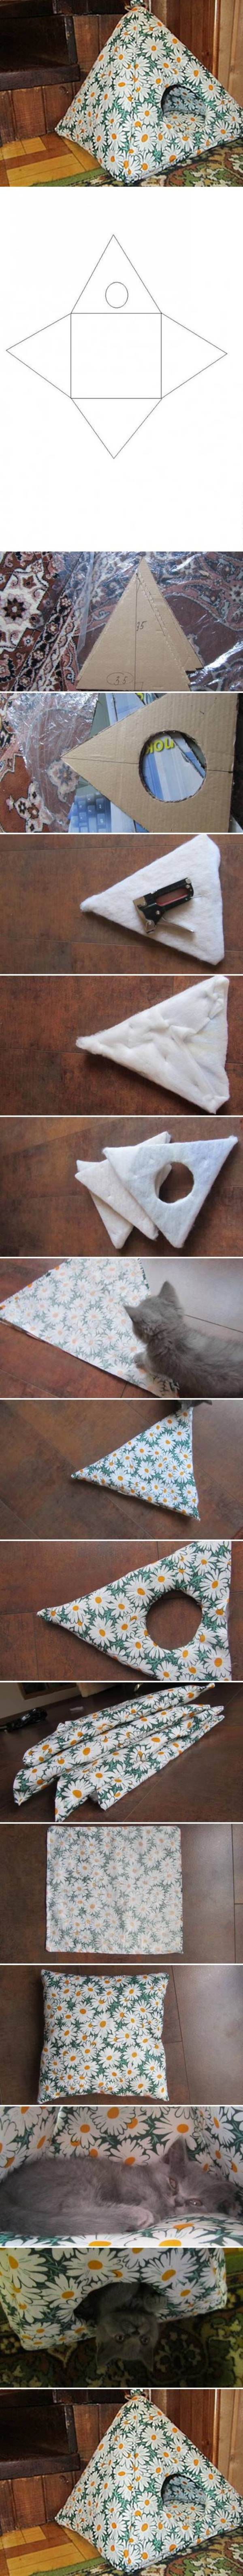 diy-cozy-cat-tent-1